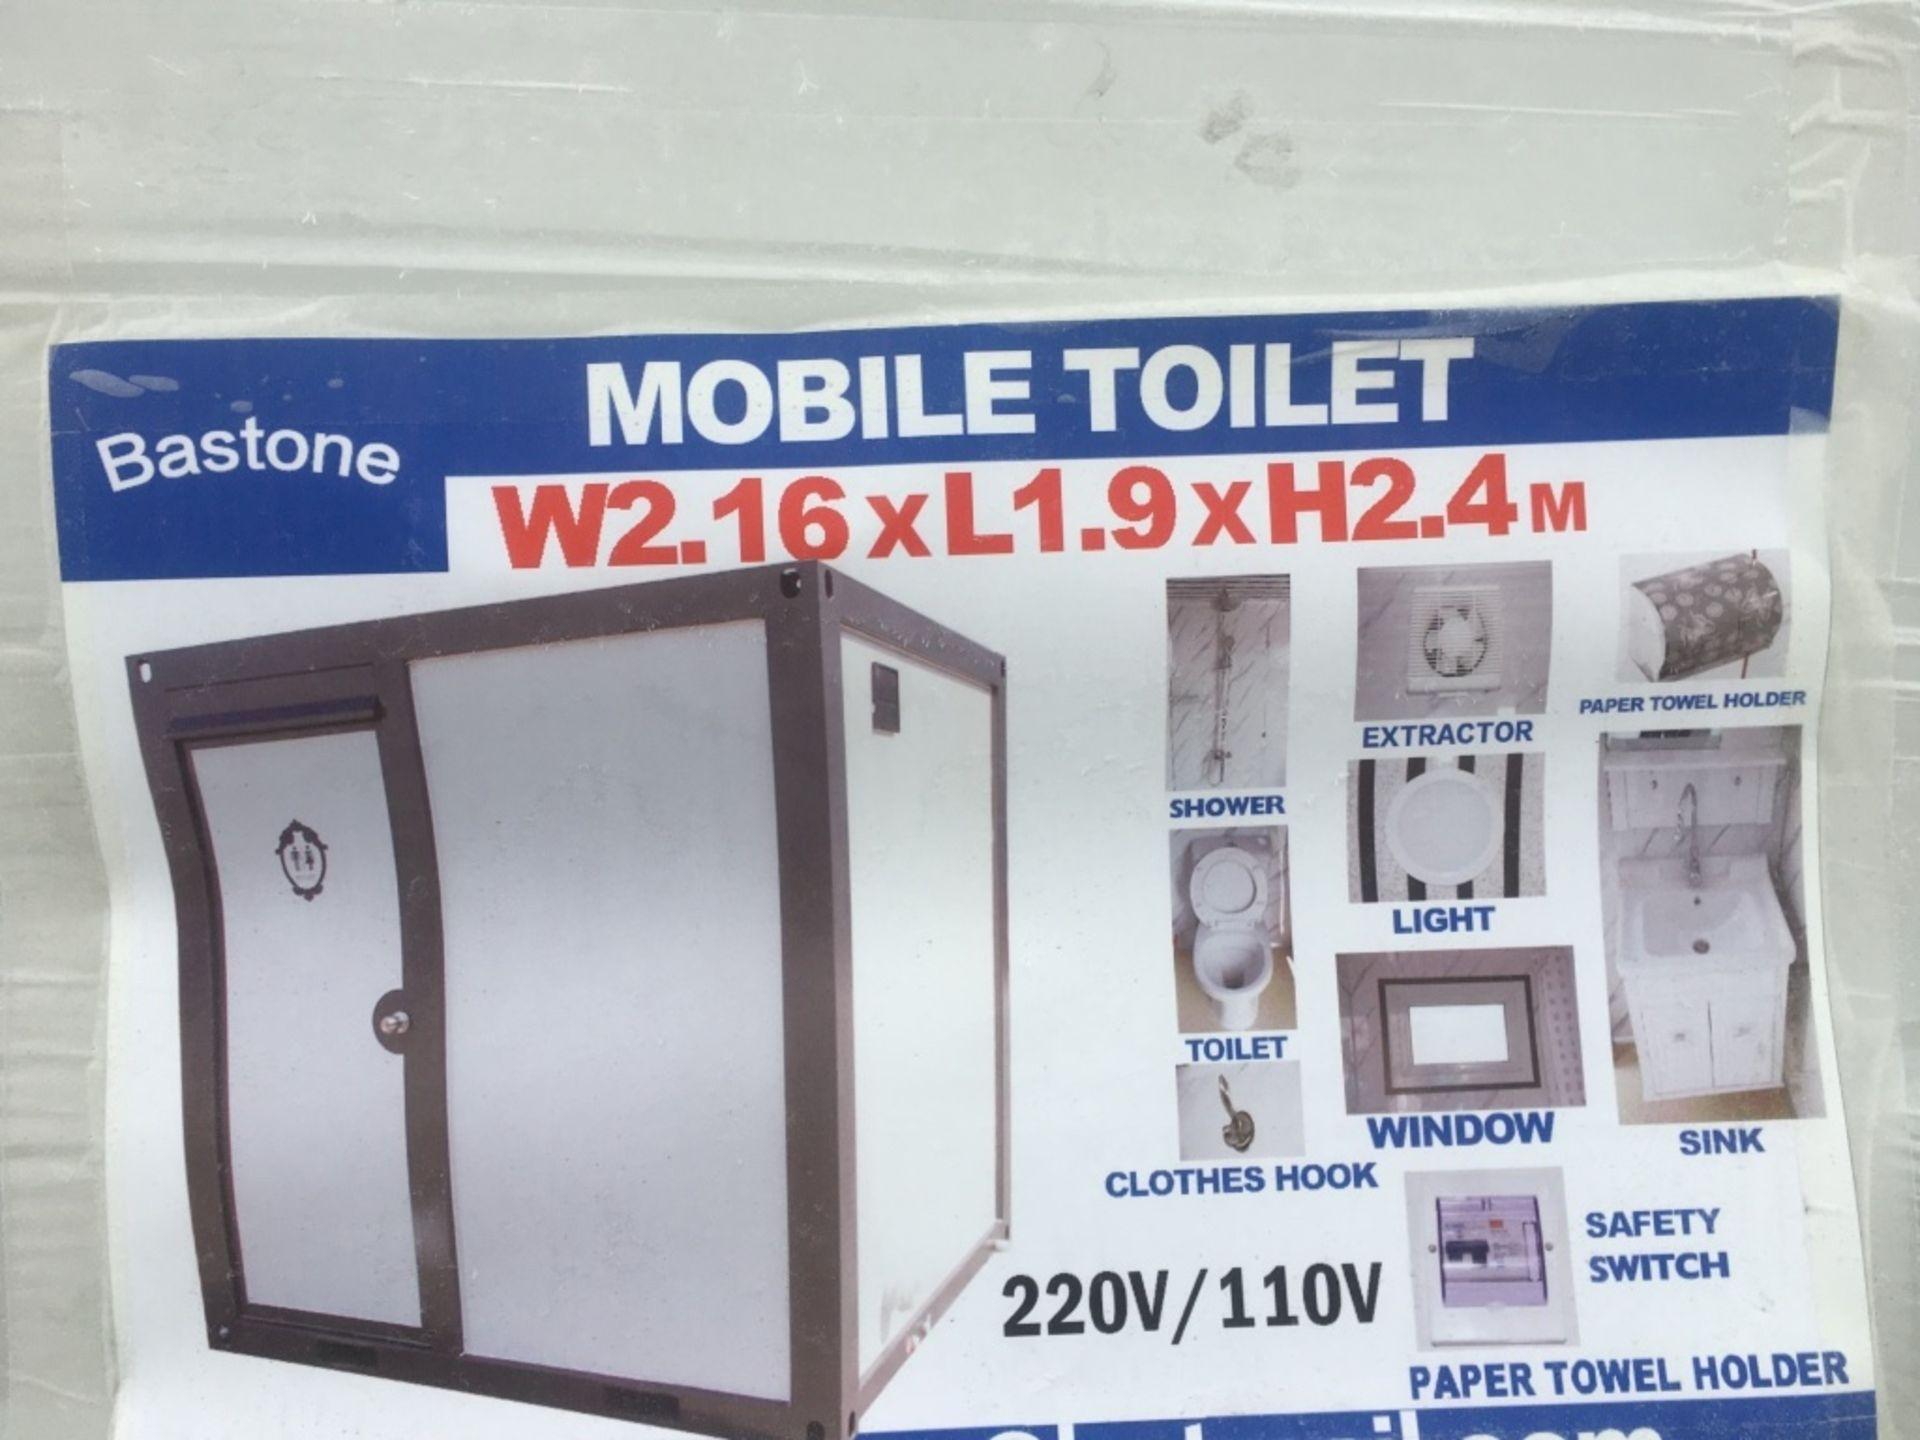 2020 Bastone Portable Restroom w/Shower - Image 5 of 5